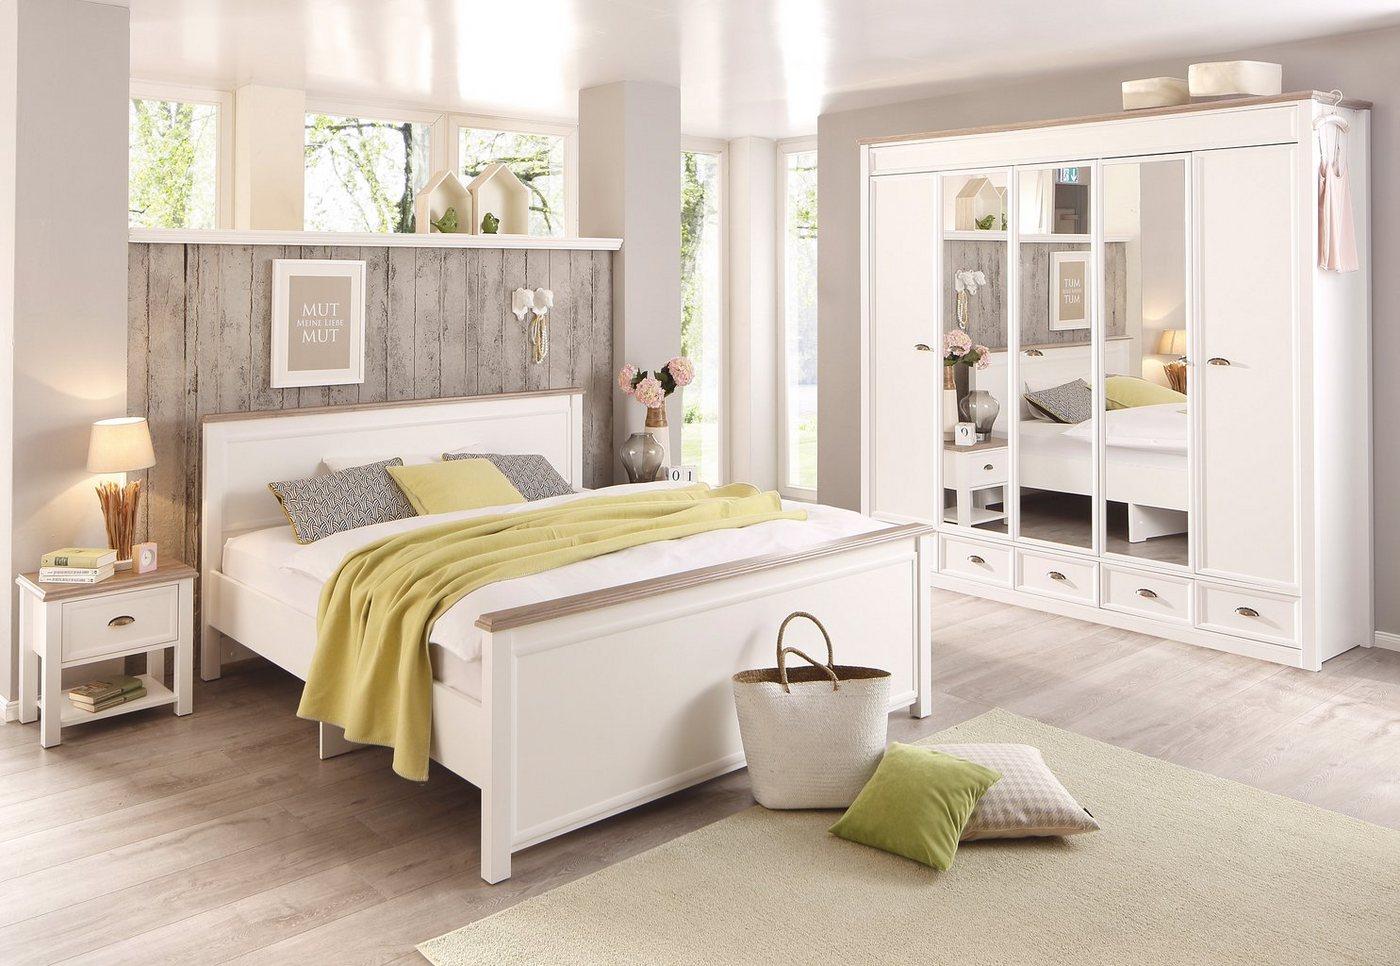 mondo schlafzimmer schr nke inspiration. Black Bedroom Furniture Sets. Home Design Ideas